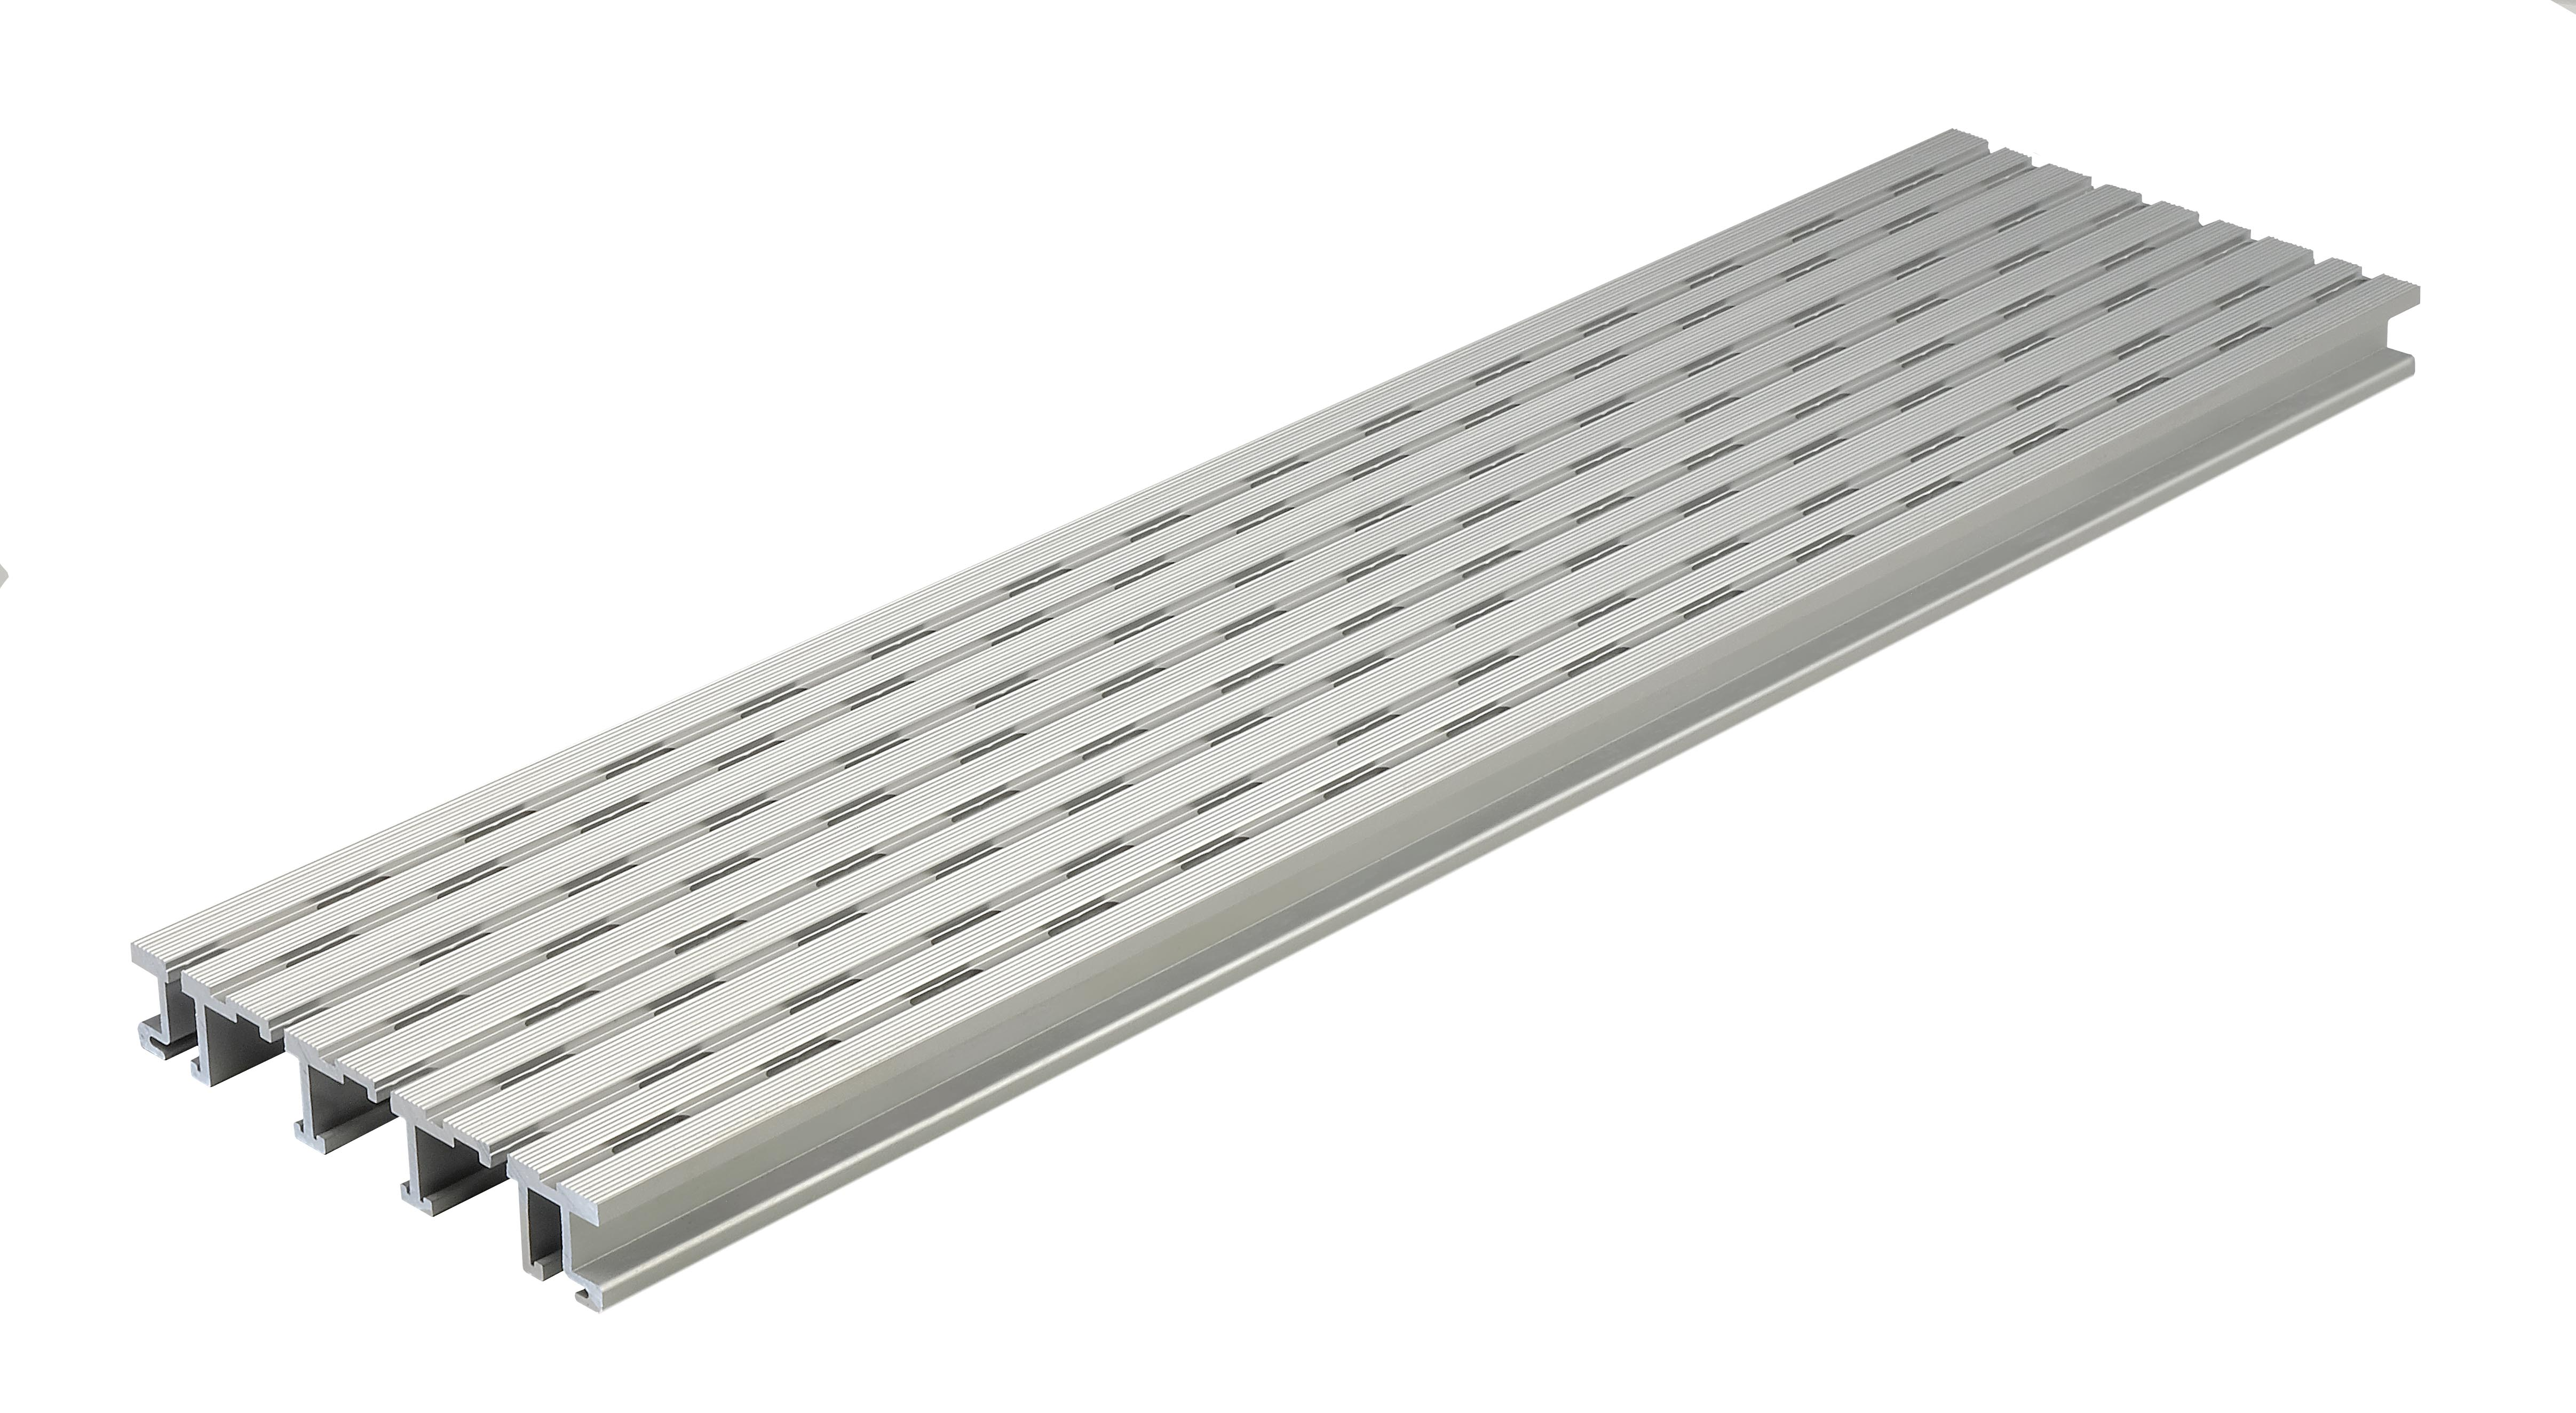 Kovalex Belüftungs-/Entwässerungsprofil Aluminium für 26 mm WPC-Dielen - 26x150x1000 mm - Aluminium Silber